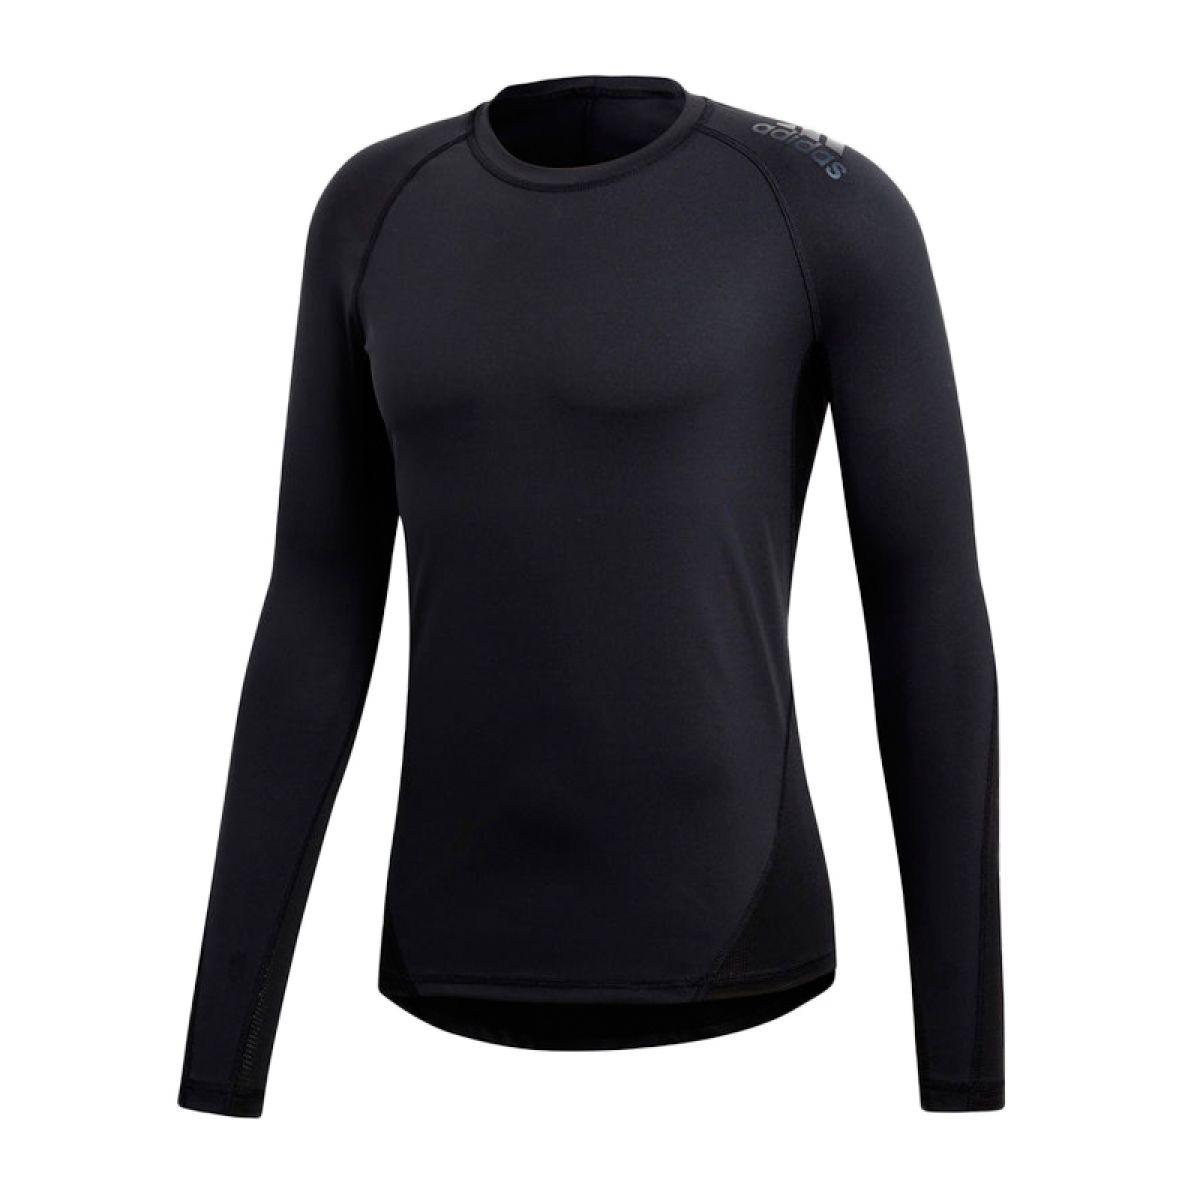 Adidas AlphaSkin Sport Tee LS chemise à manches longues